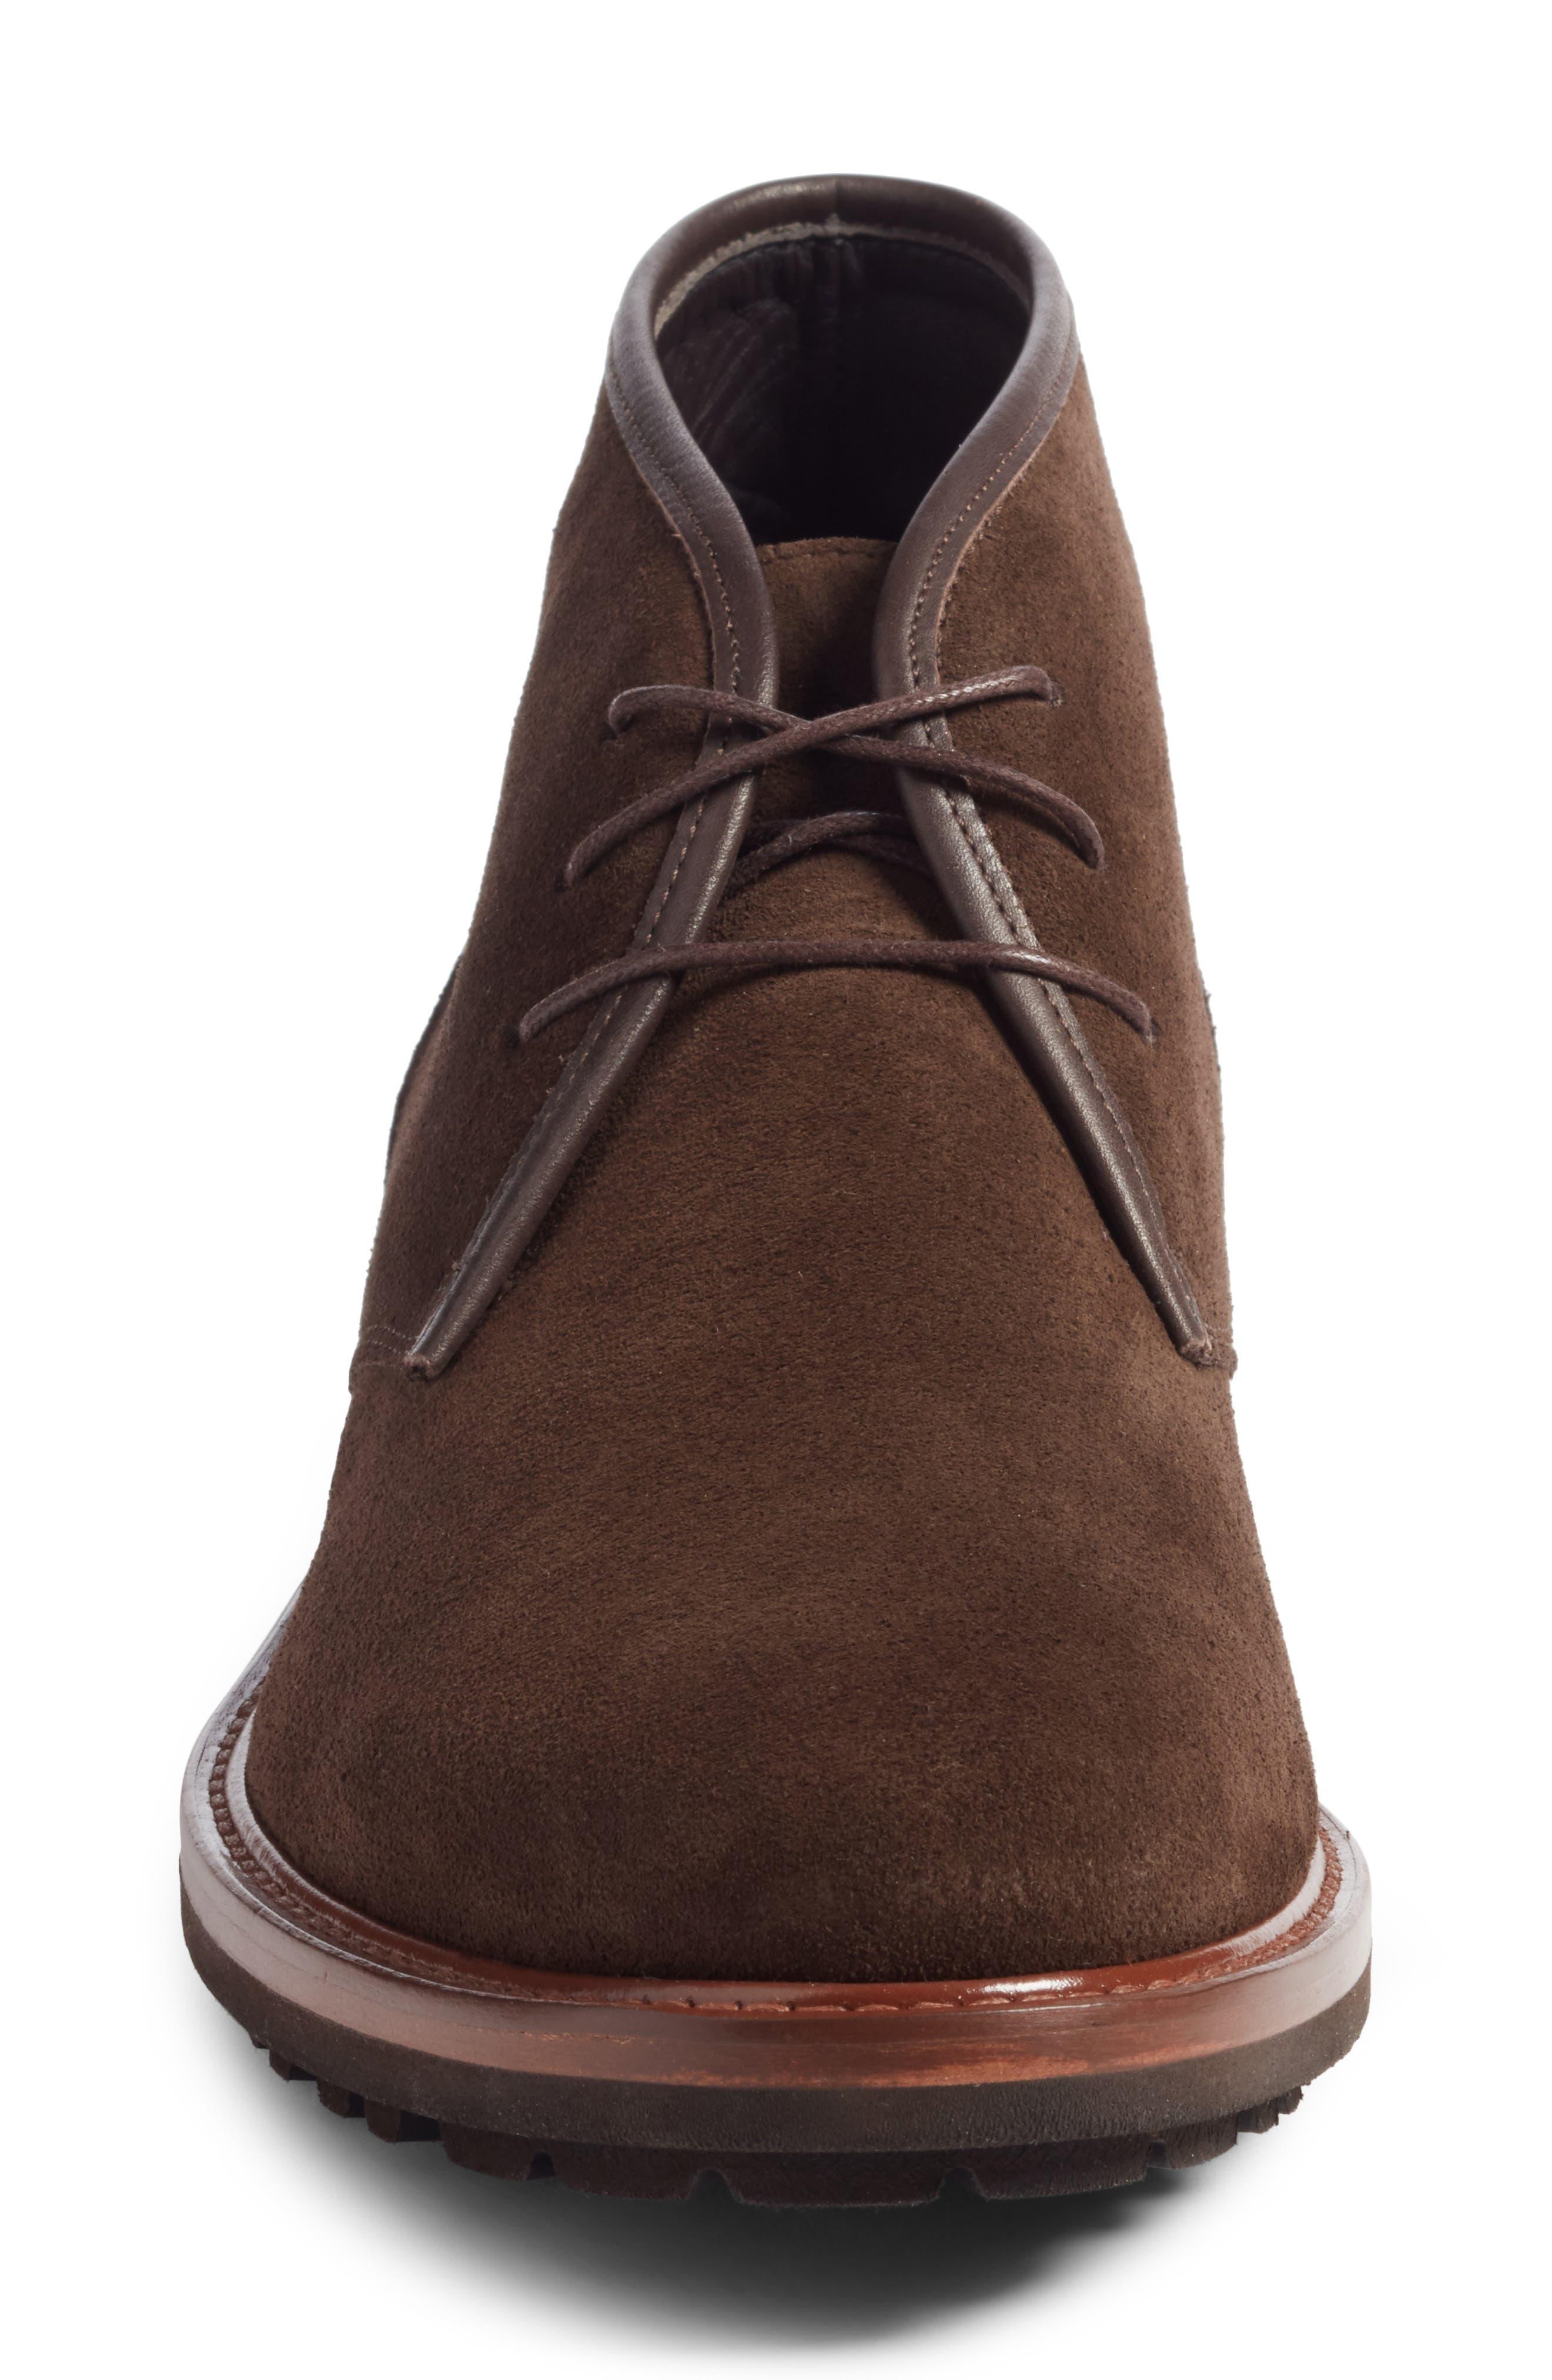 Brixen Waterproof Chukka Boot,                             Alternate thumbnail 4, color,                             Brown Suede